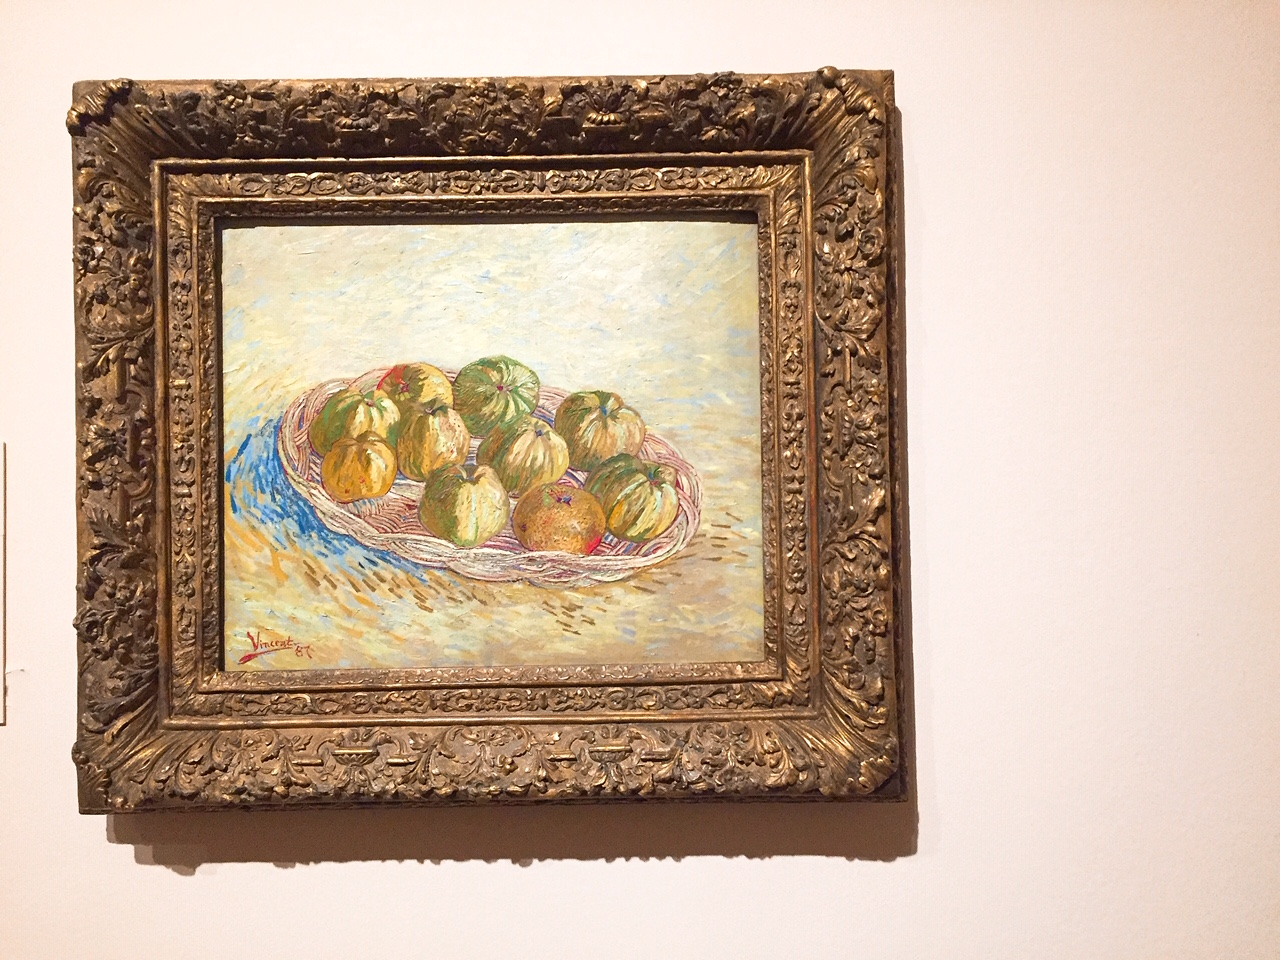 Van Gogh, Still Life, Basket of Apples. 1887. Saint Louis Art Museum.